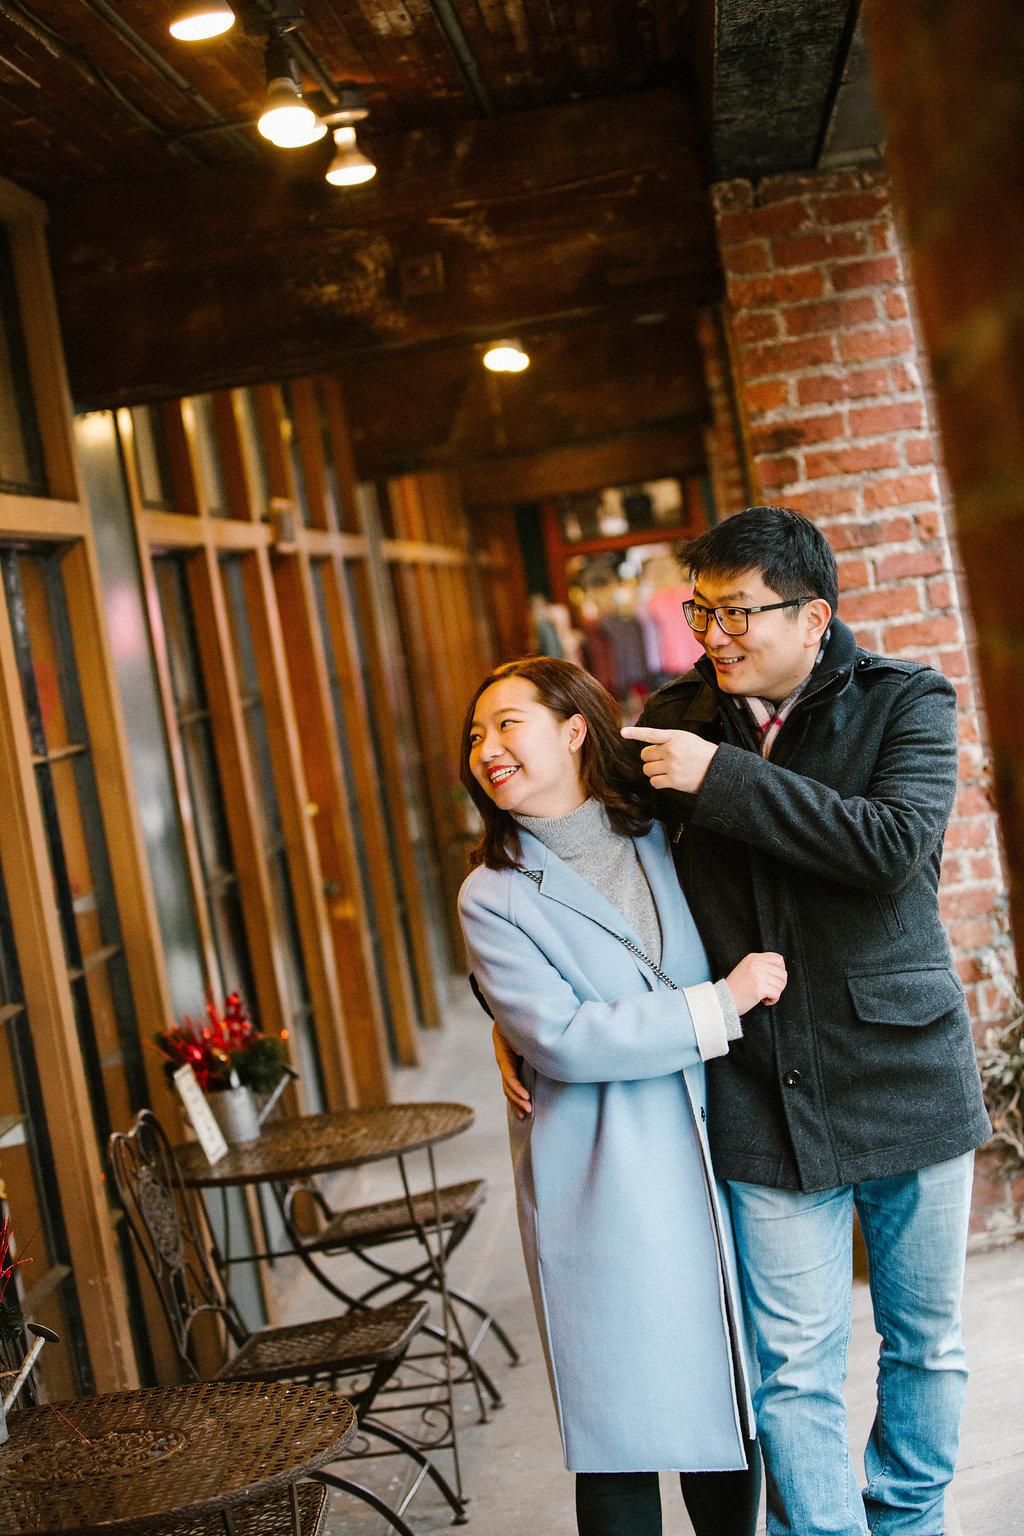 Qian+Jacson_best+Seattle+wedding+Photographer_APW26.JPG